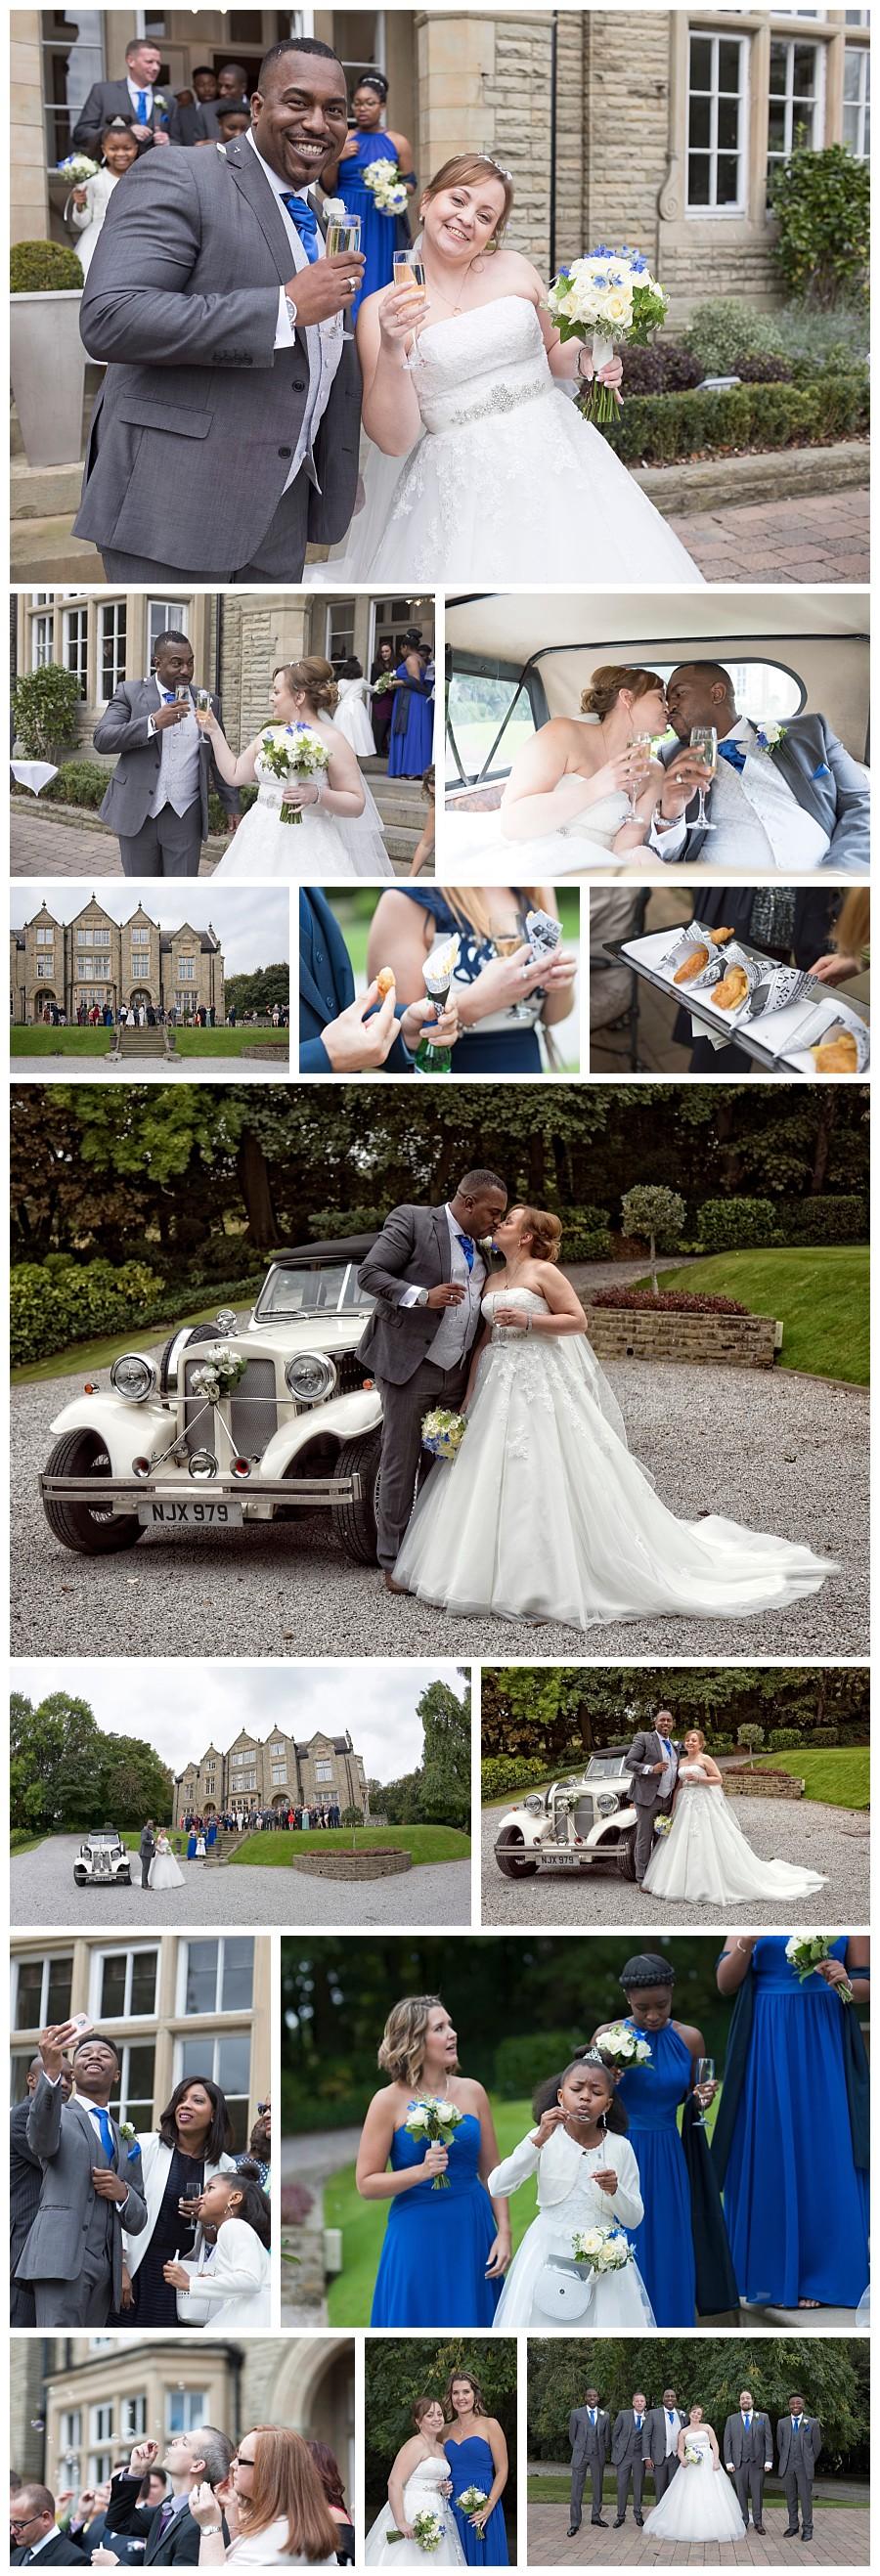 Wedding Photography Woodlands Hotel Leeds, recommended wedding photographers Woodlands hotel Leeds, bride & groom wedding photos woodlands hotel